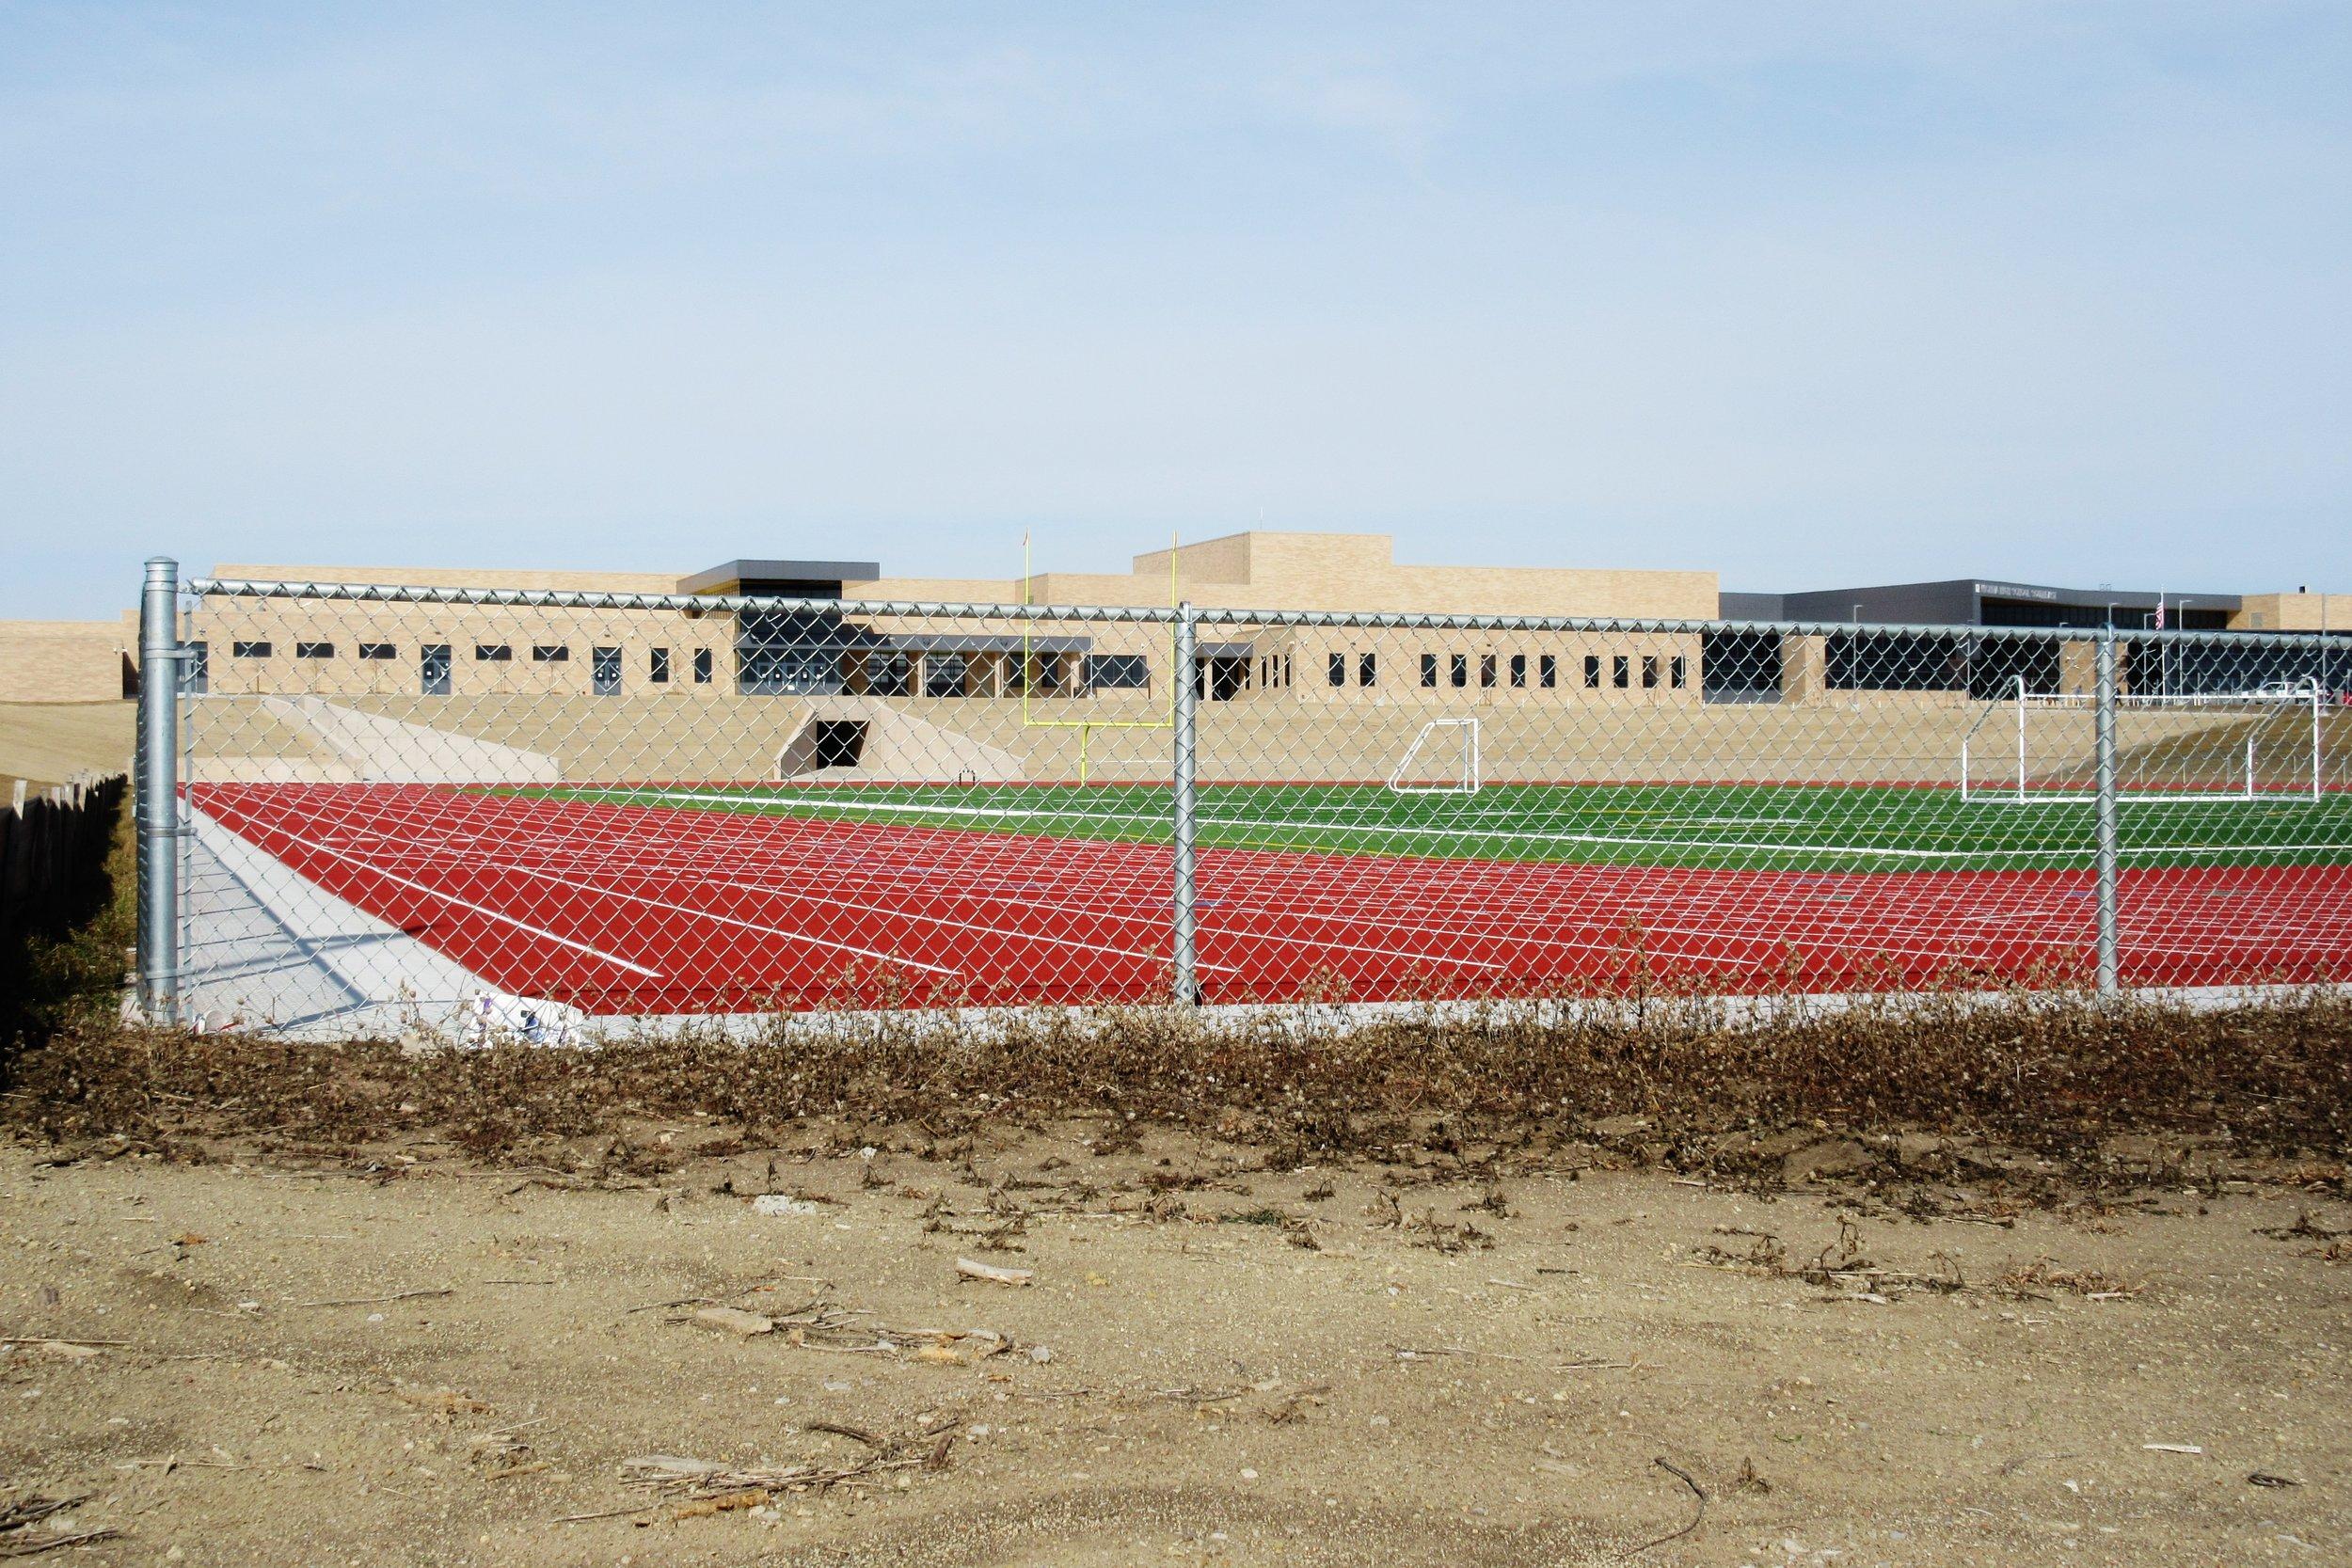 Industrial-galvanized-steel-chain-link-fencing-Wichita-KS-Southeast-High-School-USD259-67210